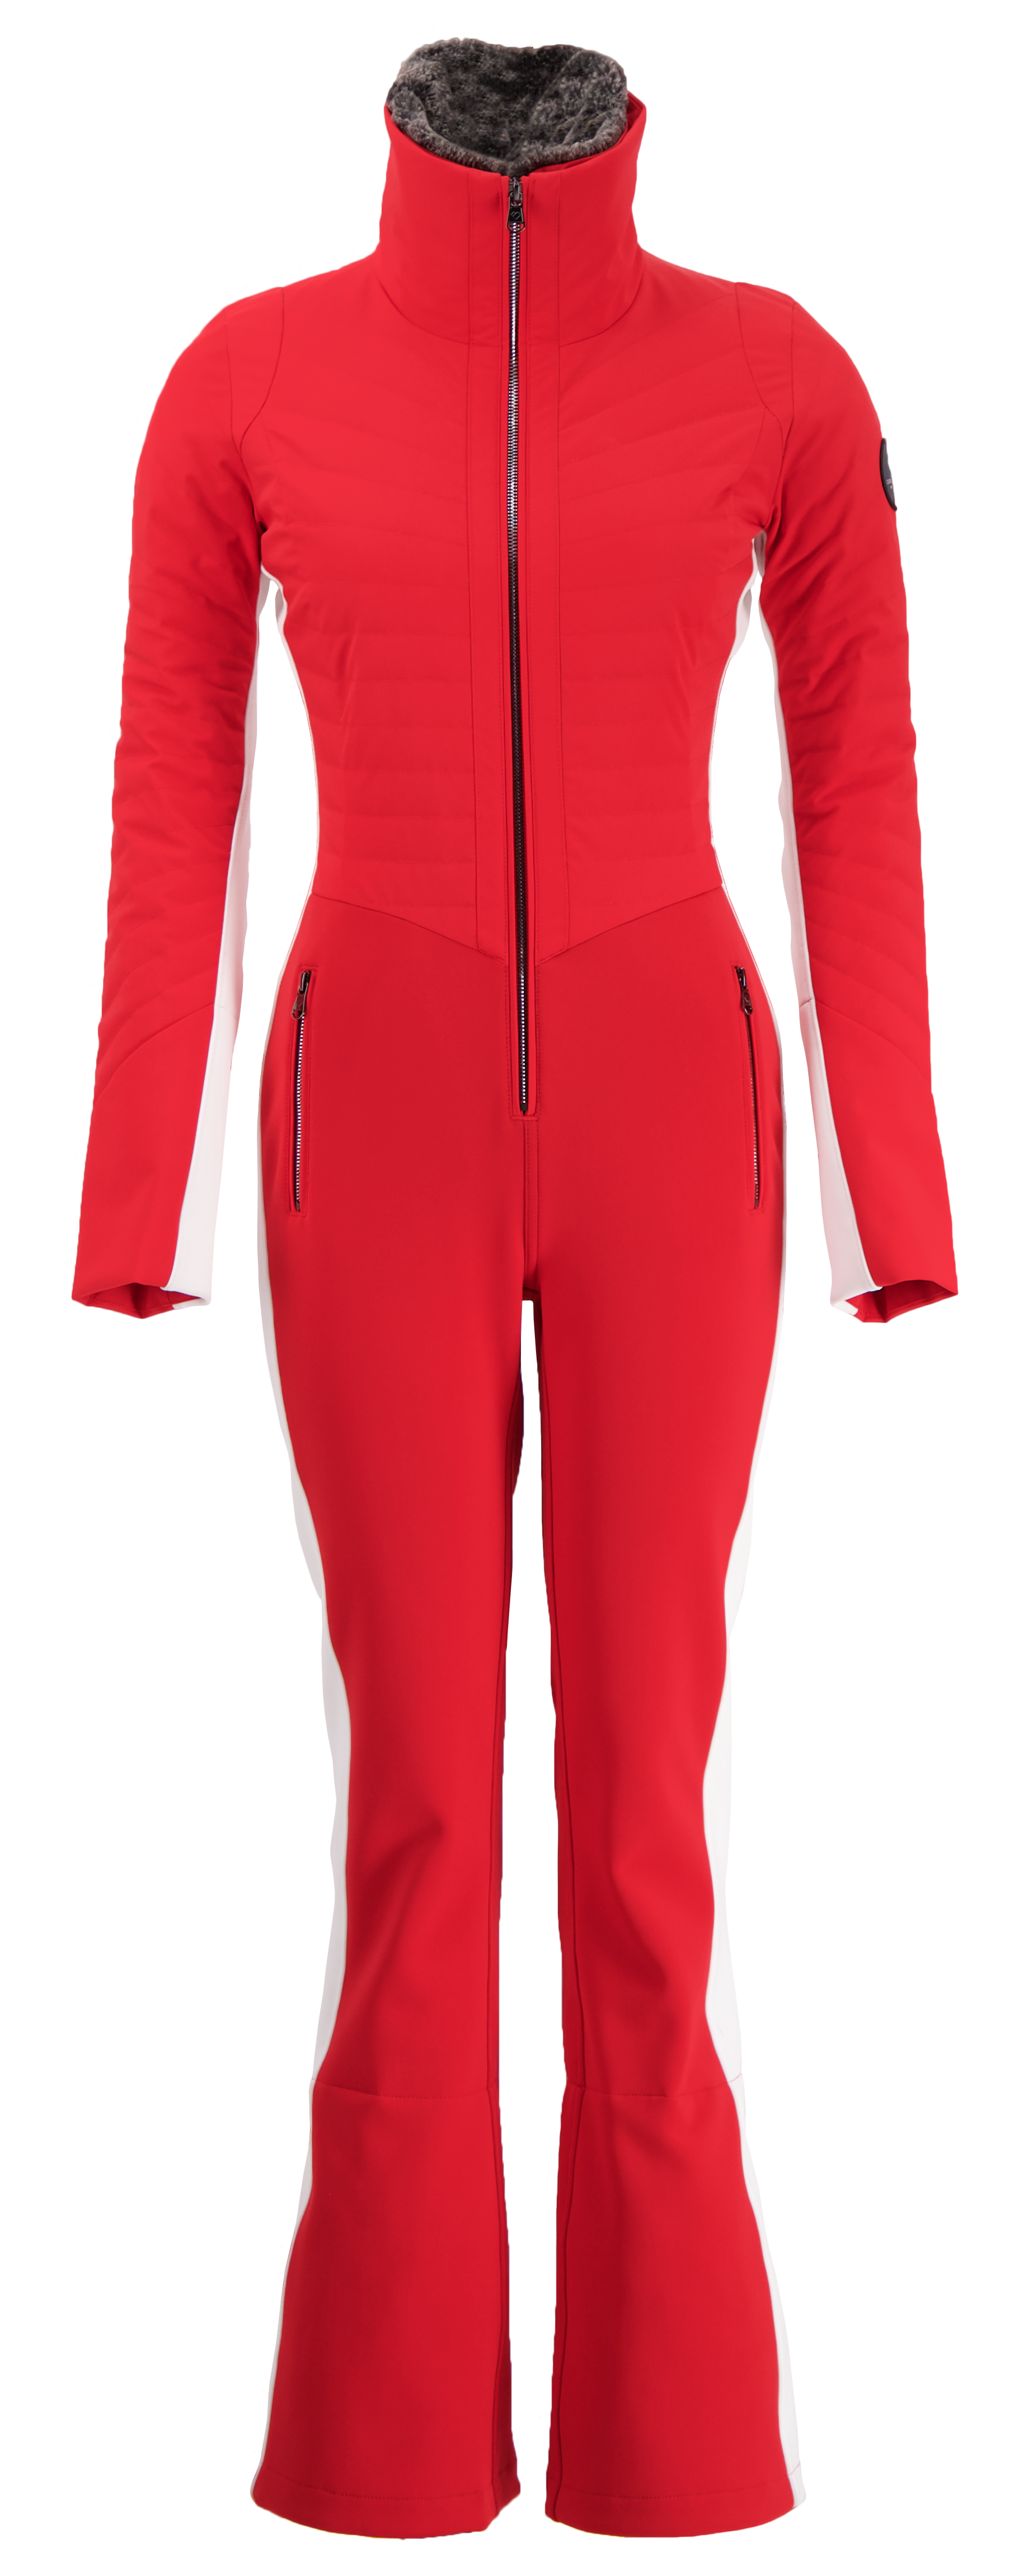 2016 Women's K2 OoolaLuv 85 Ti